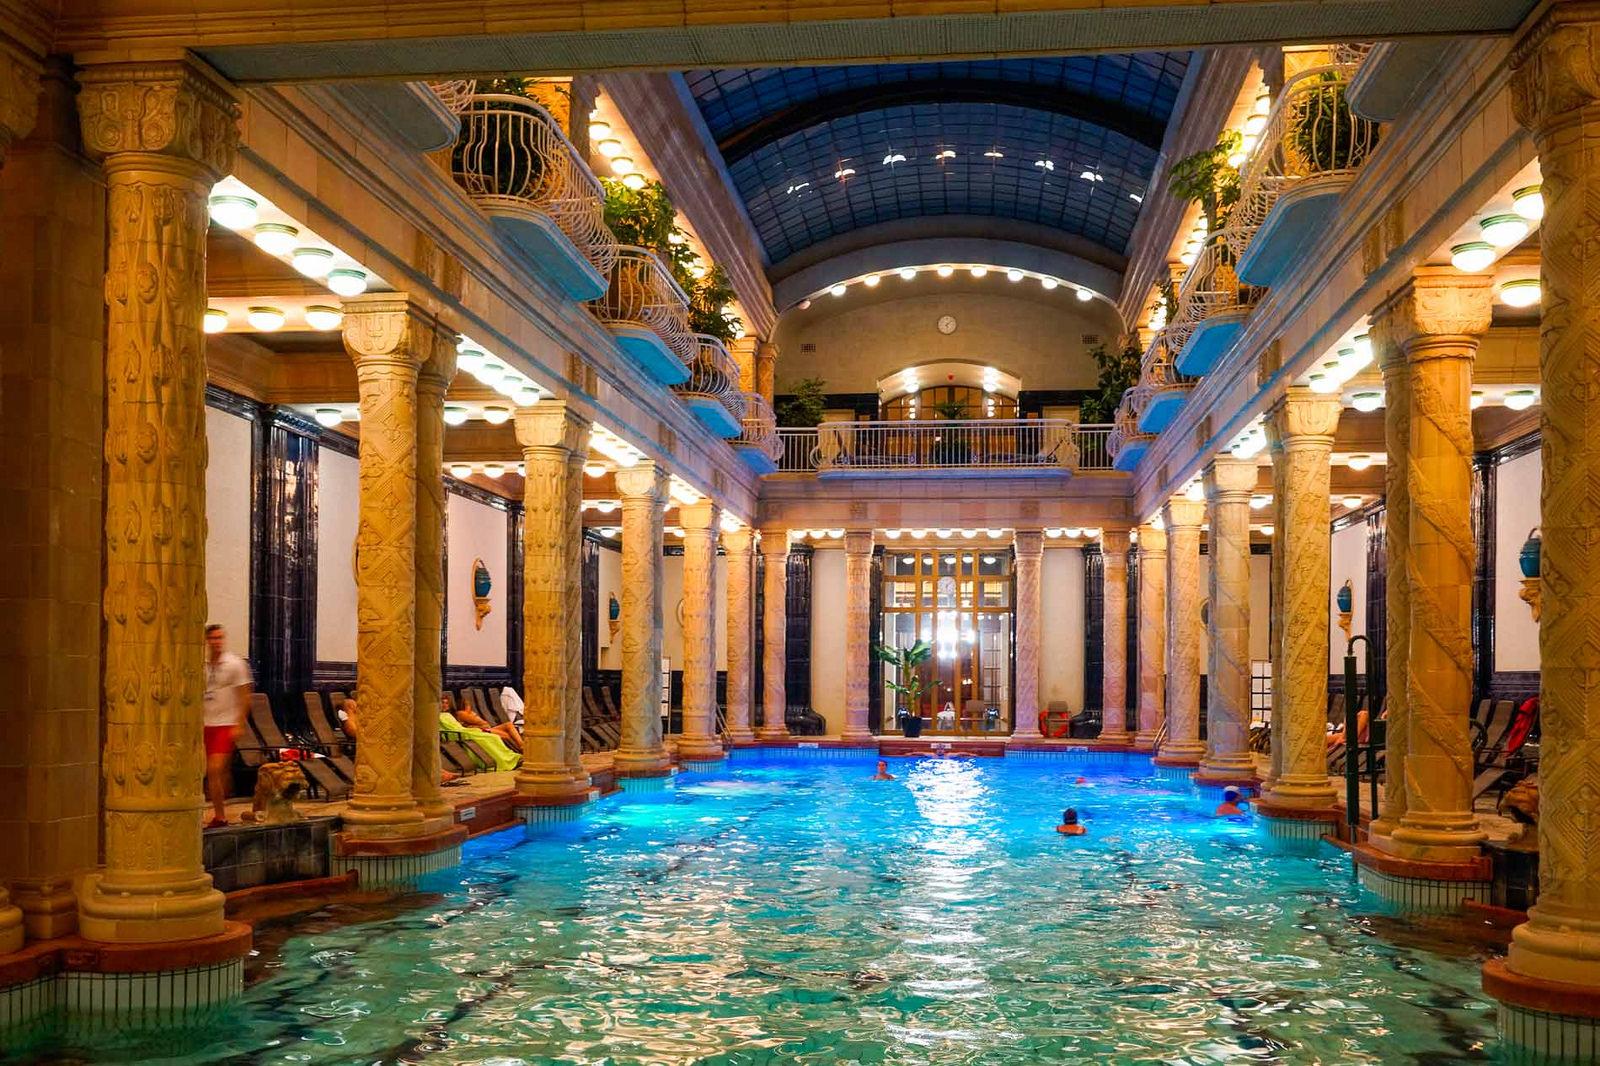 Gellert Thermal Baths and Spa. Foto da Flickr